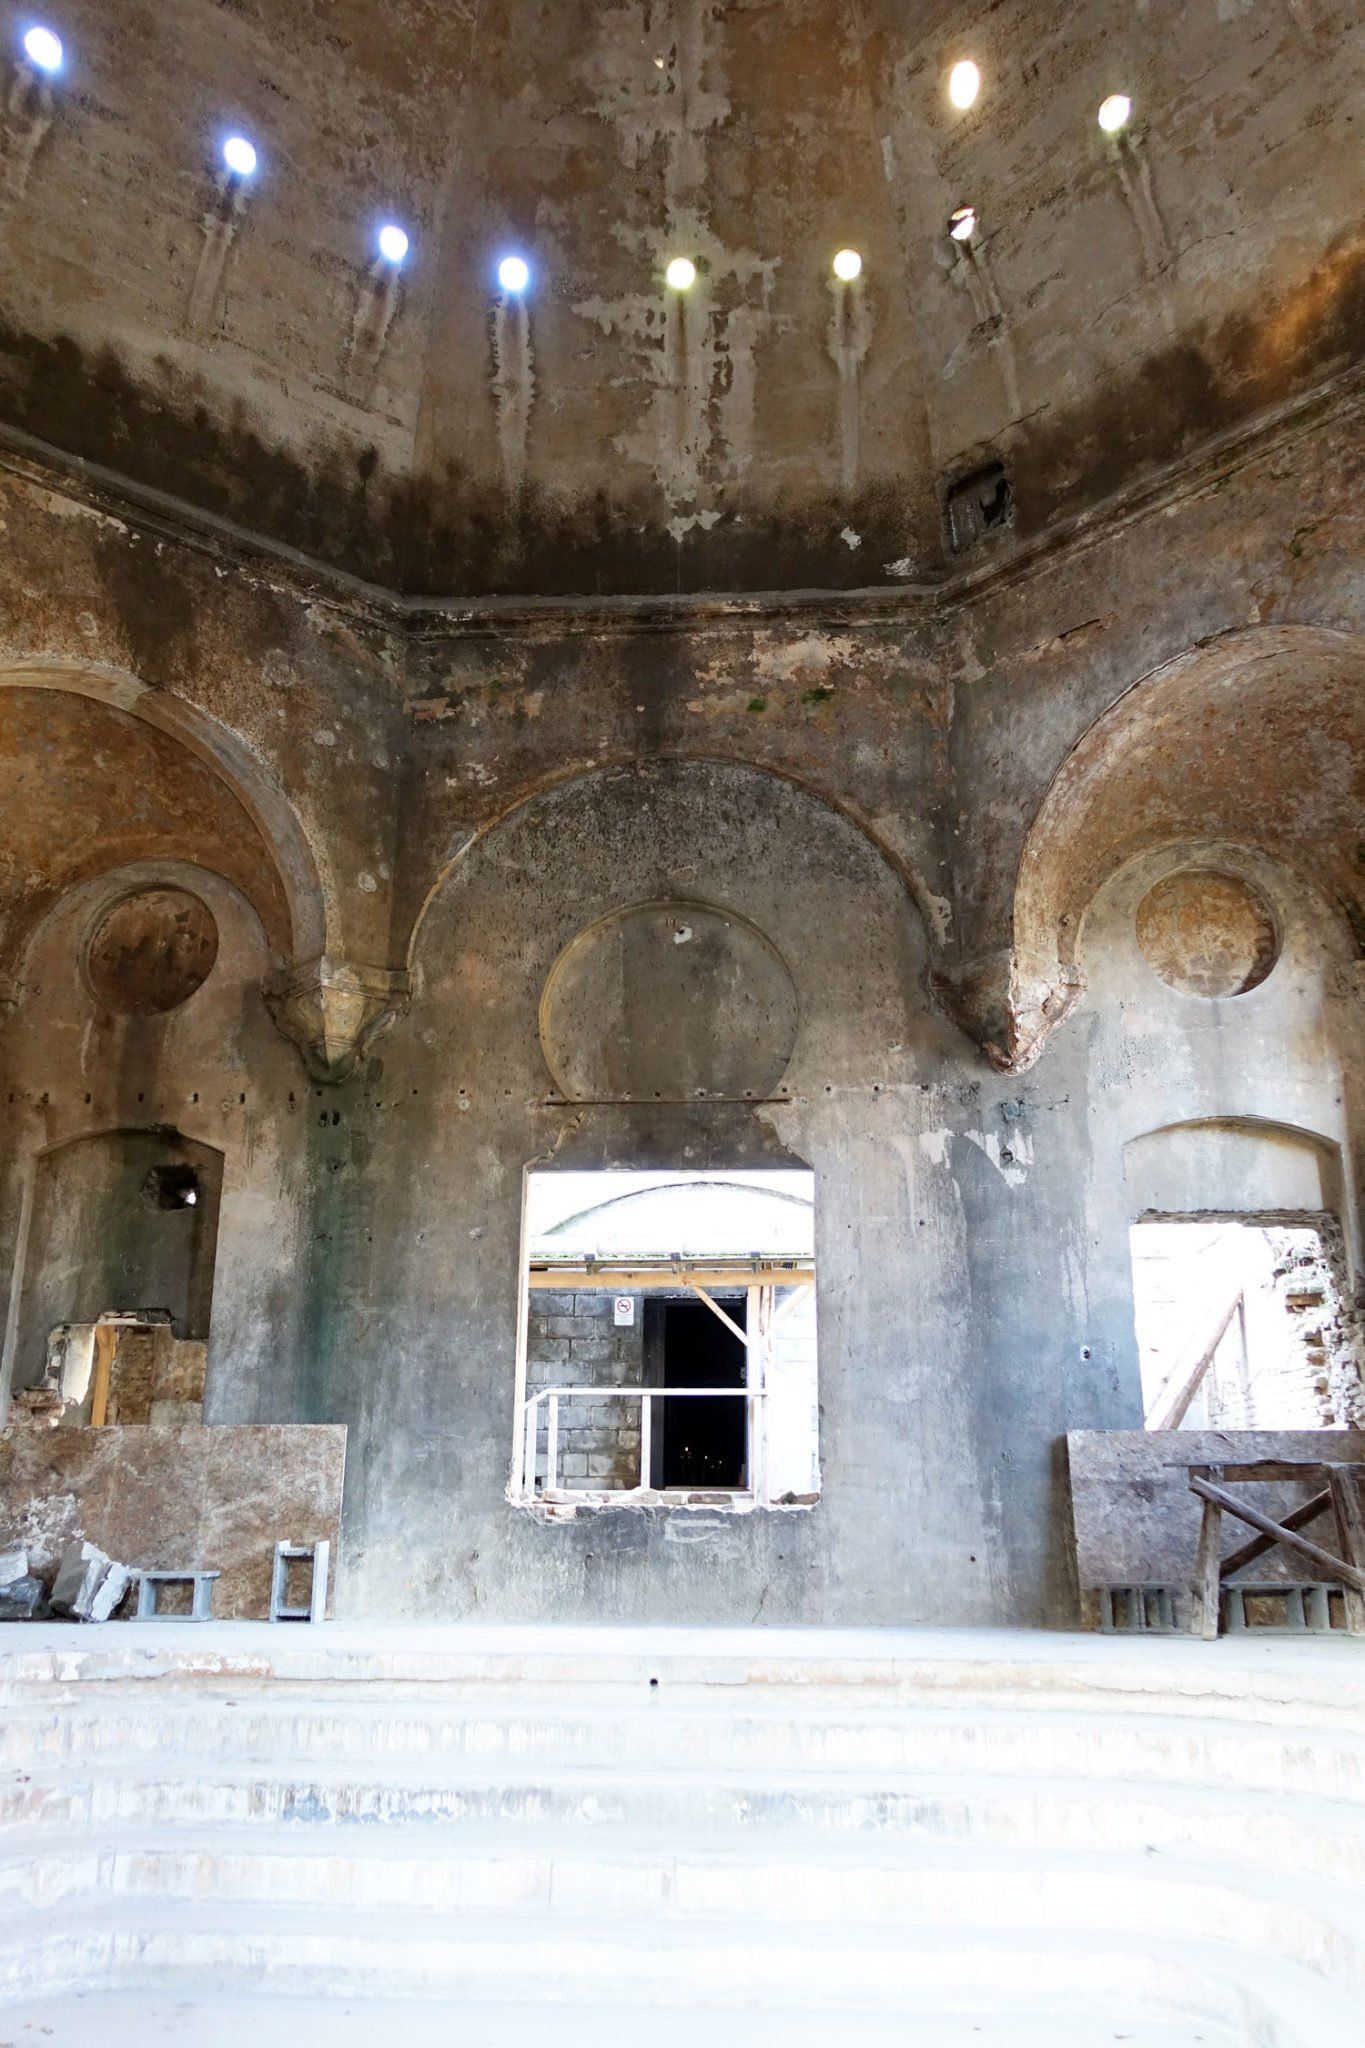 Budapest Thermal Baths molnar janos cave turkish powder mill interior